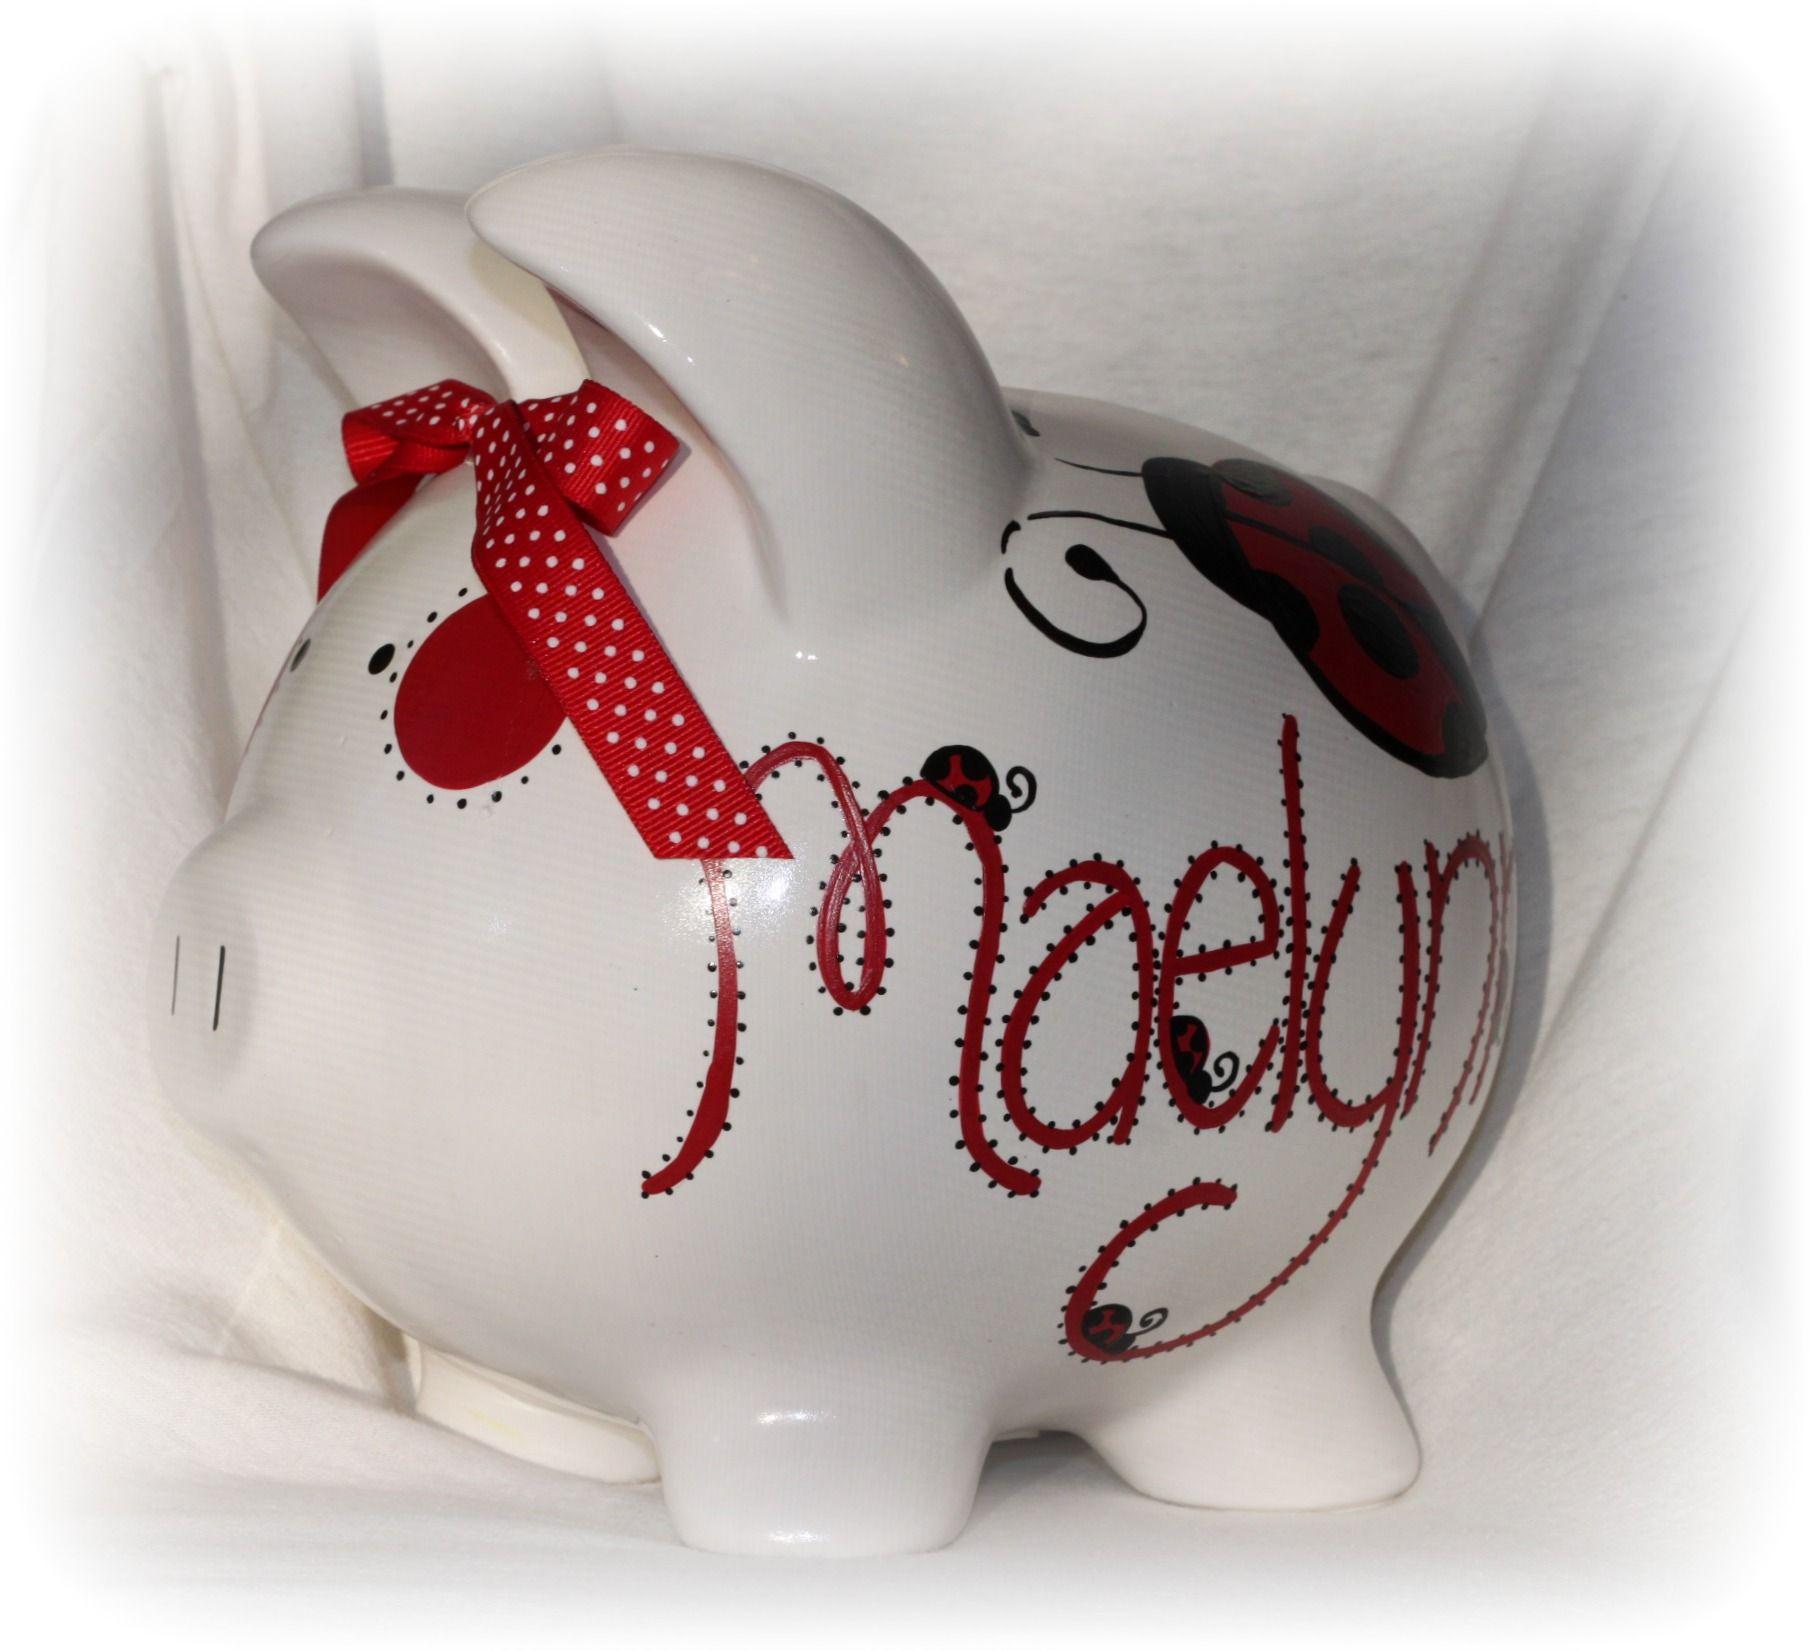 ladybug piggy bank  kids room  pinterest  ladybugs and piggy bank - piggy bank · ladybug piggy bank